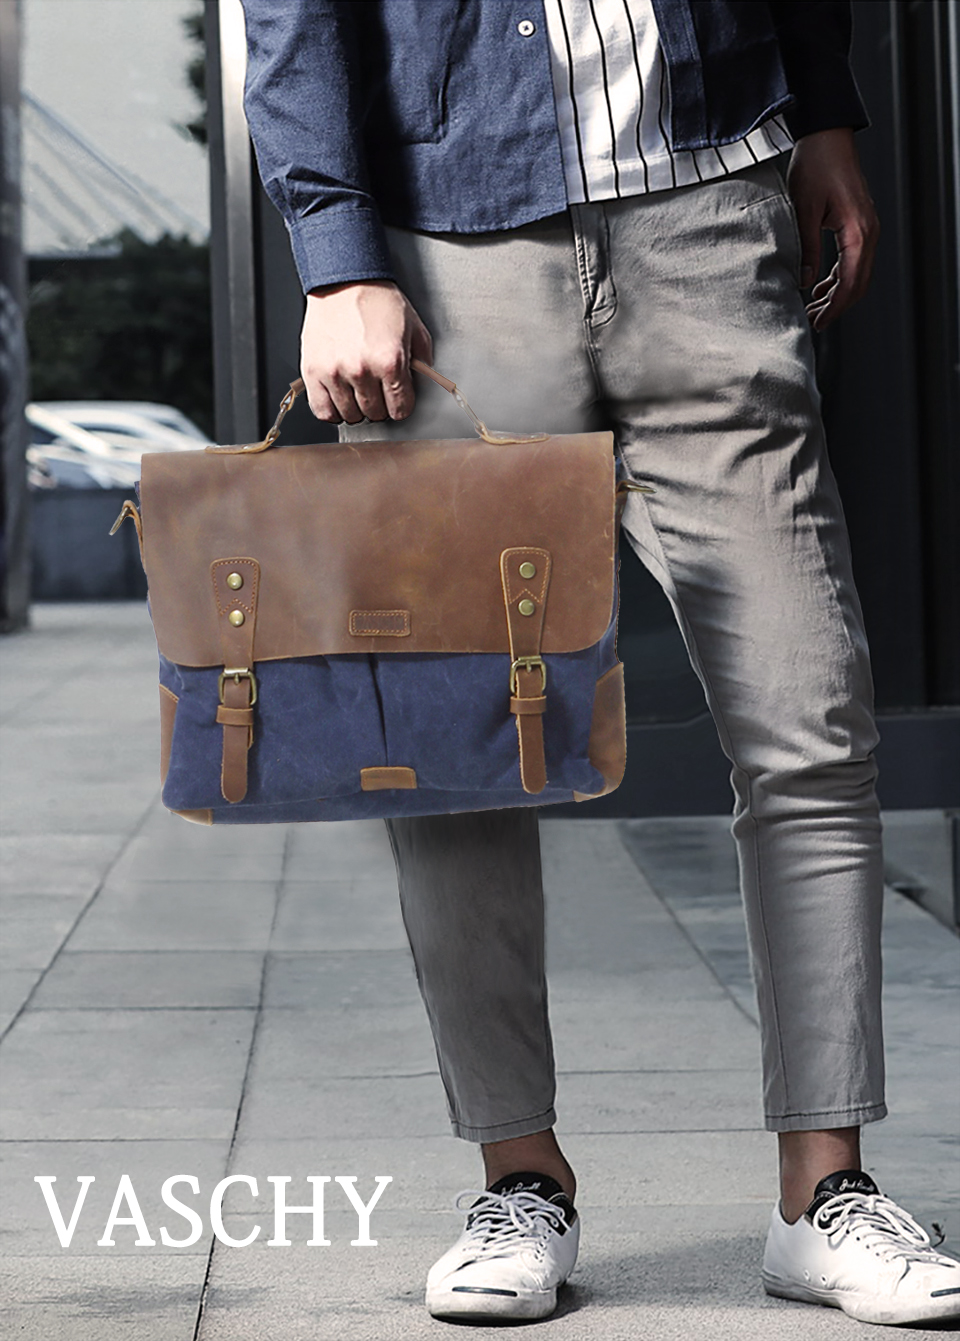 HTB12N 3XzzuK1Rjy0Fpq6yEpFXaI VASCHY Messenger Bag Men Leather Genuine Leather Canvas 14inch Laptop Briefcase Crossbody Satchel Bag for Men